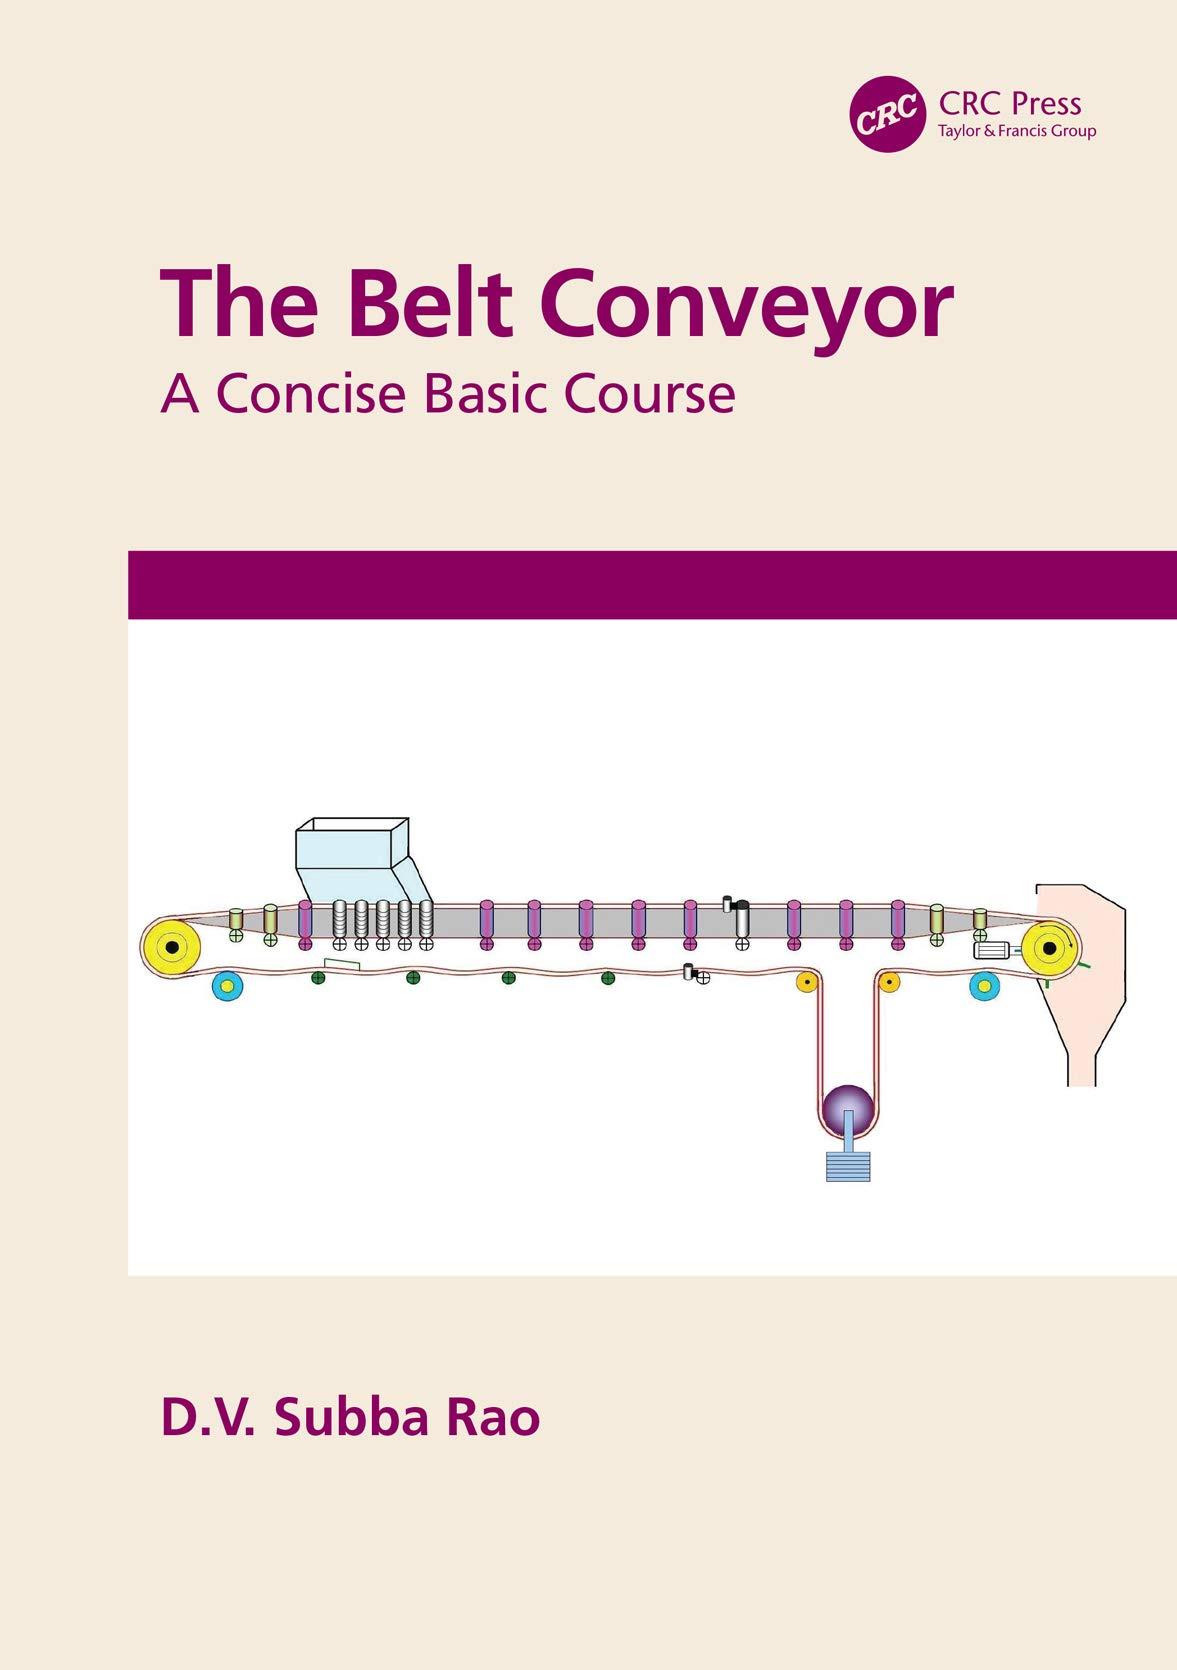 The Belt Conveyor: A Concise Basic Course